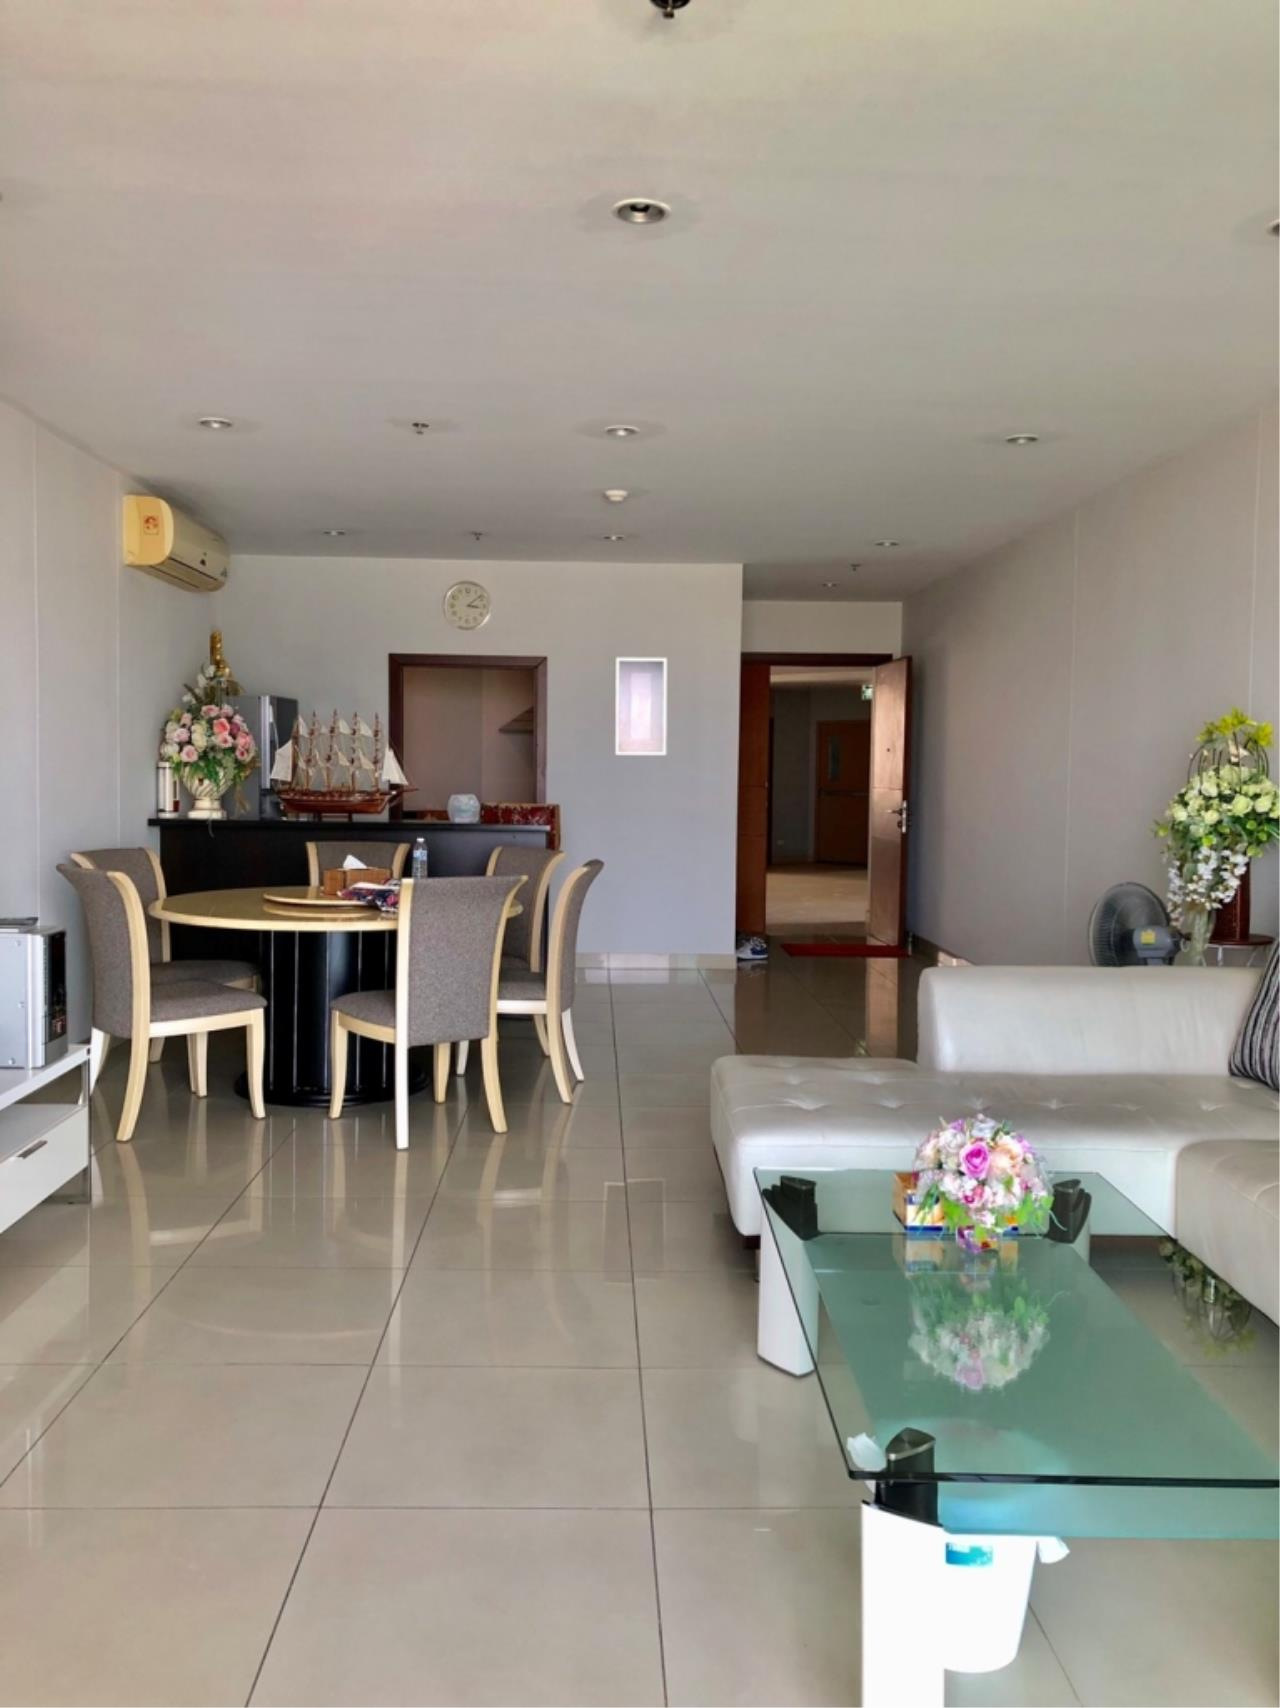 Century21 Skylux Agency's The Star Estate @ Narathiwas / Condo For Sale / 3 Bedroom / 165.34 SQM / BTS Chong Nonsi / Bangkok 2